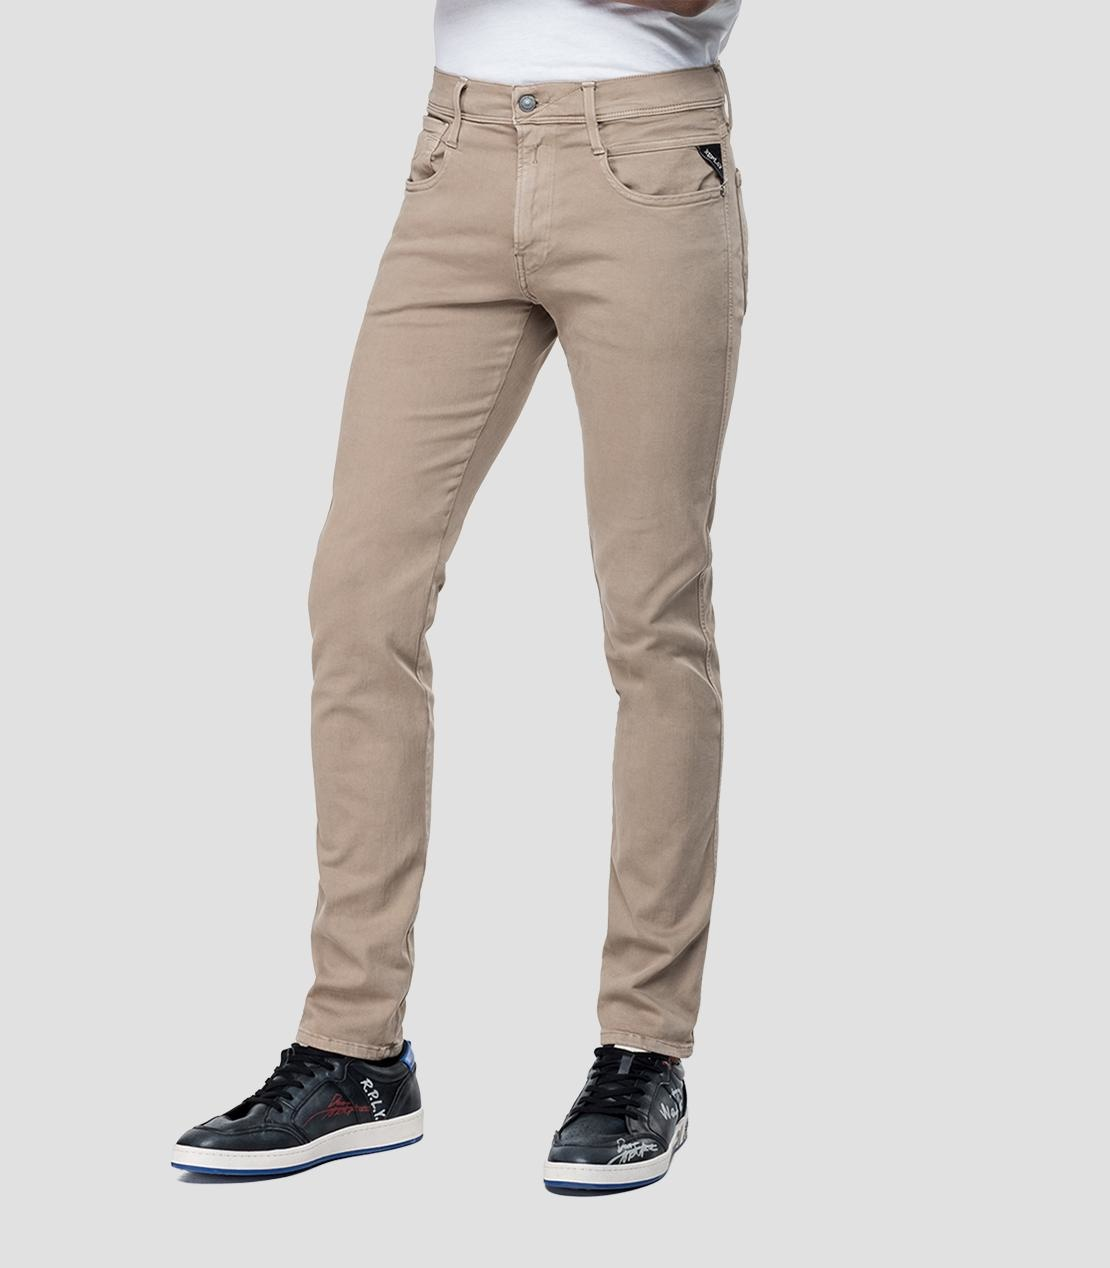 REPLAY jean coupe slim hyperflex-2